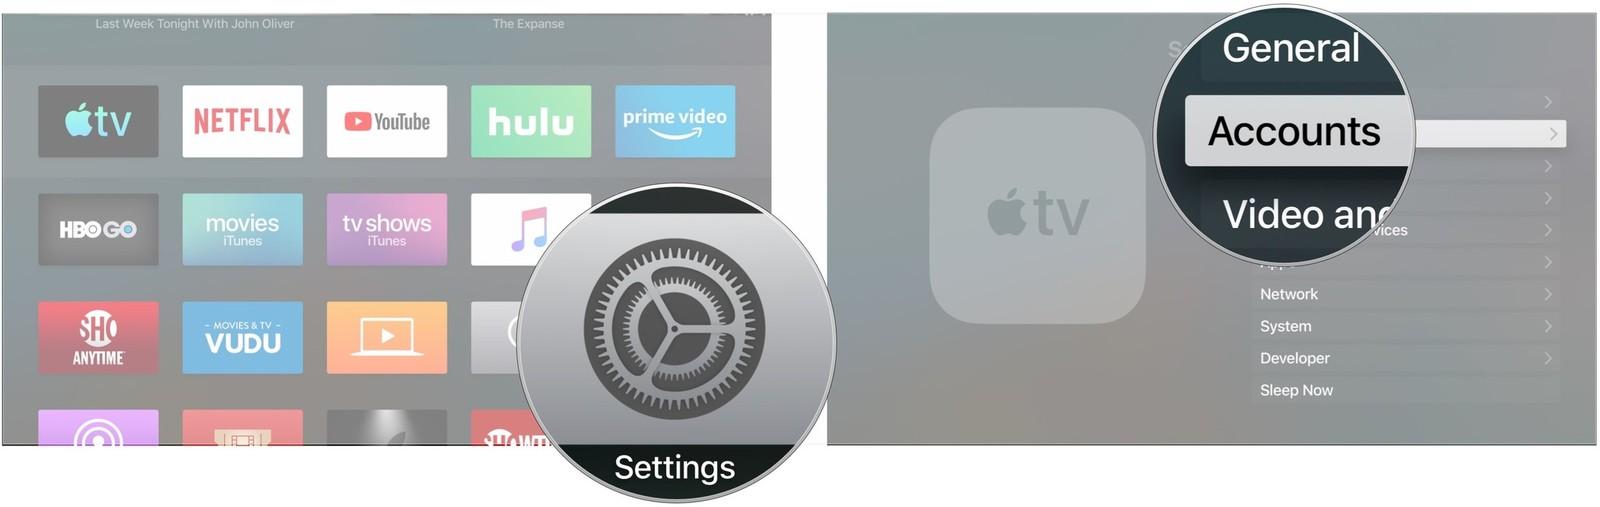 how to set up apple tv box on roku